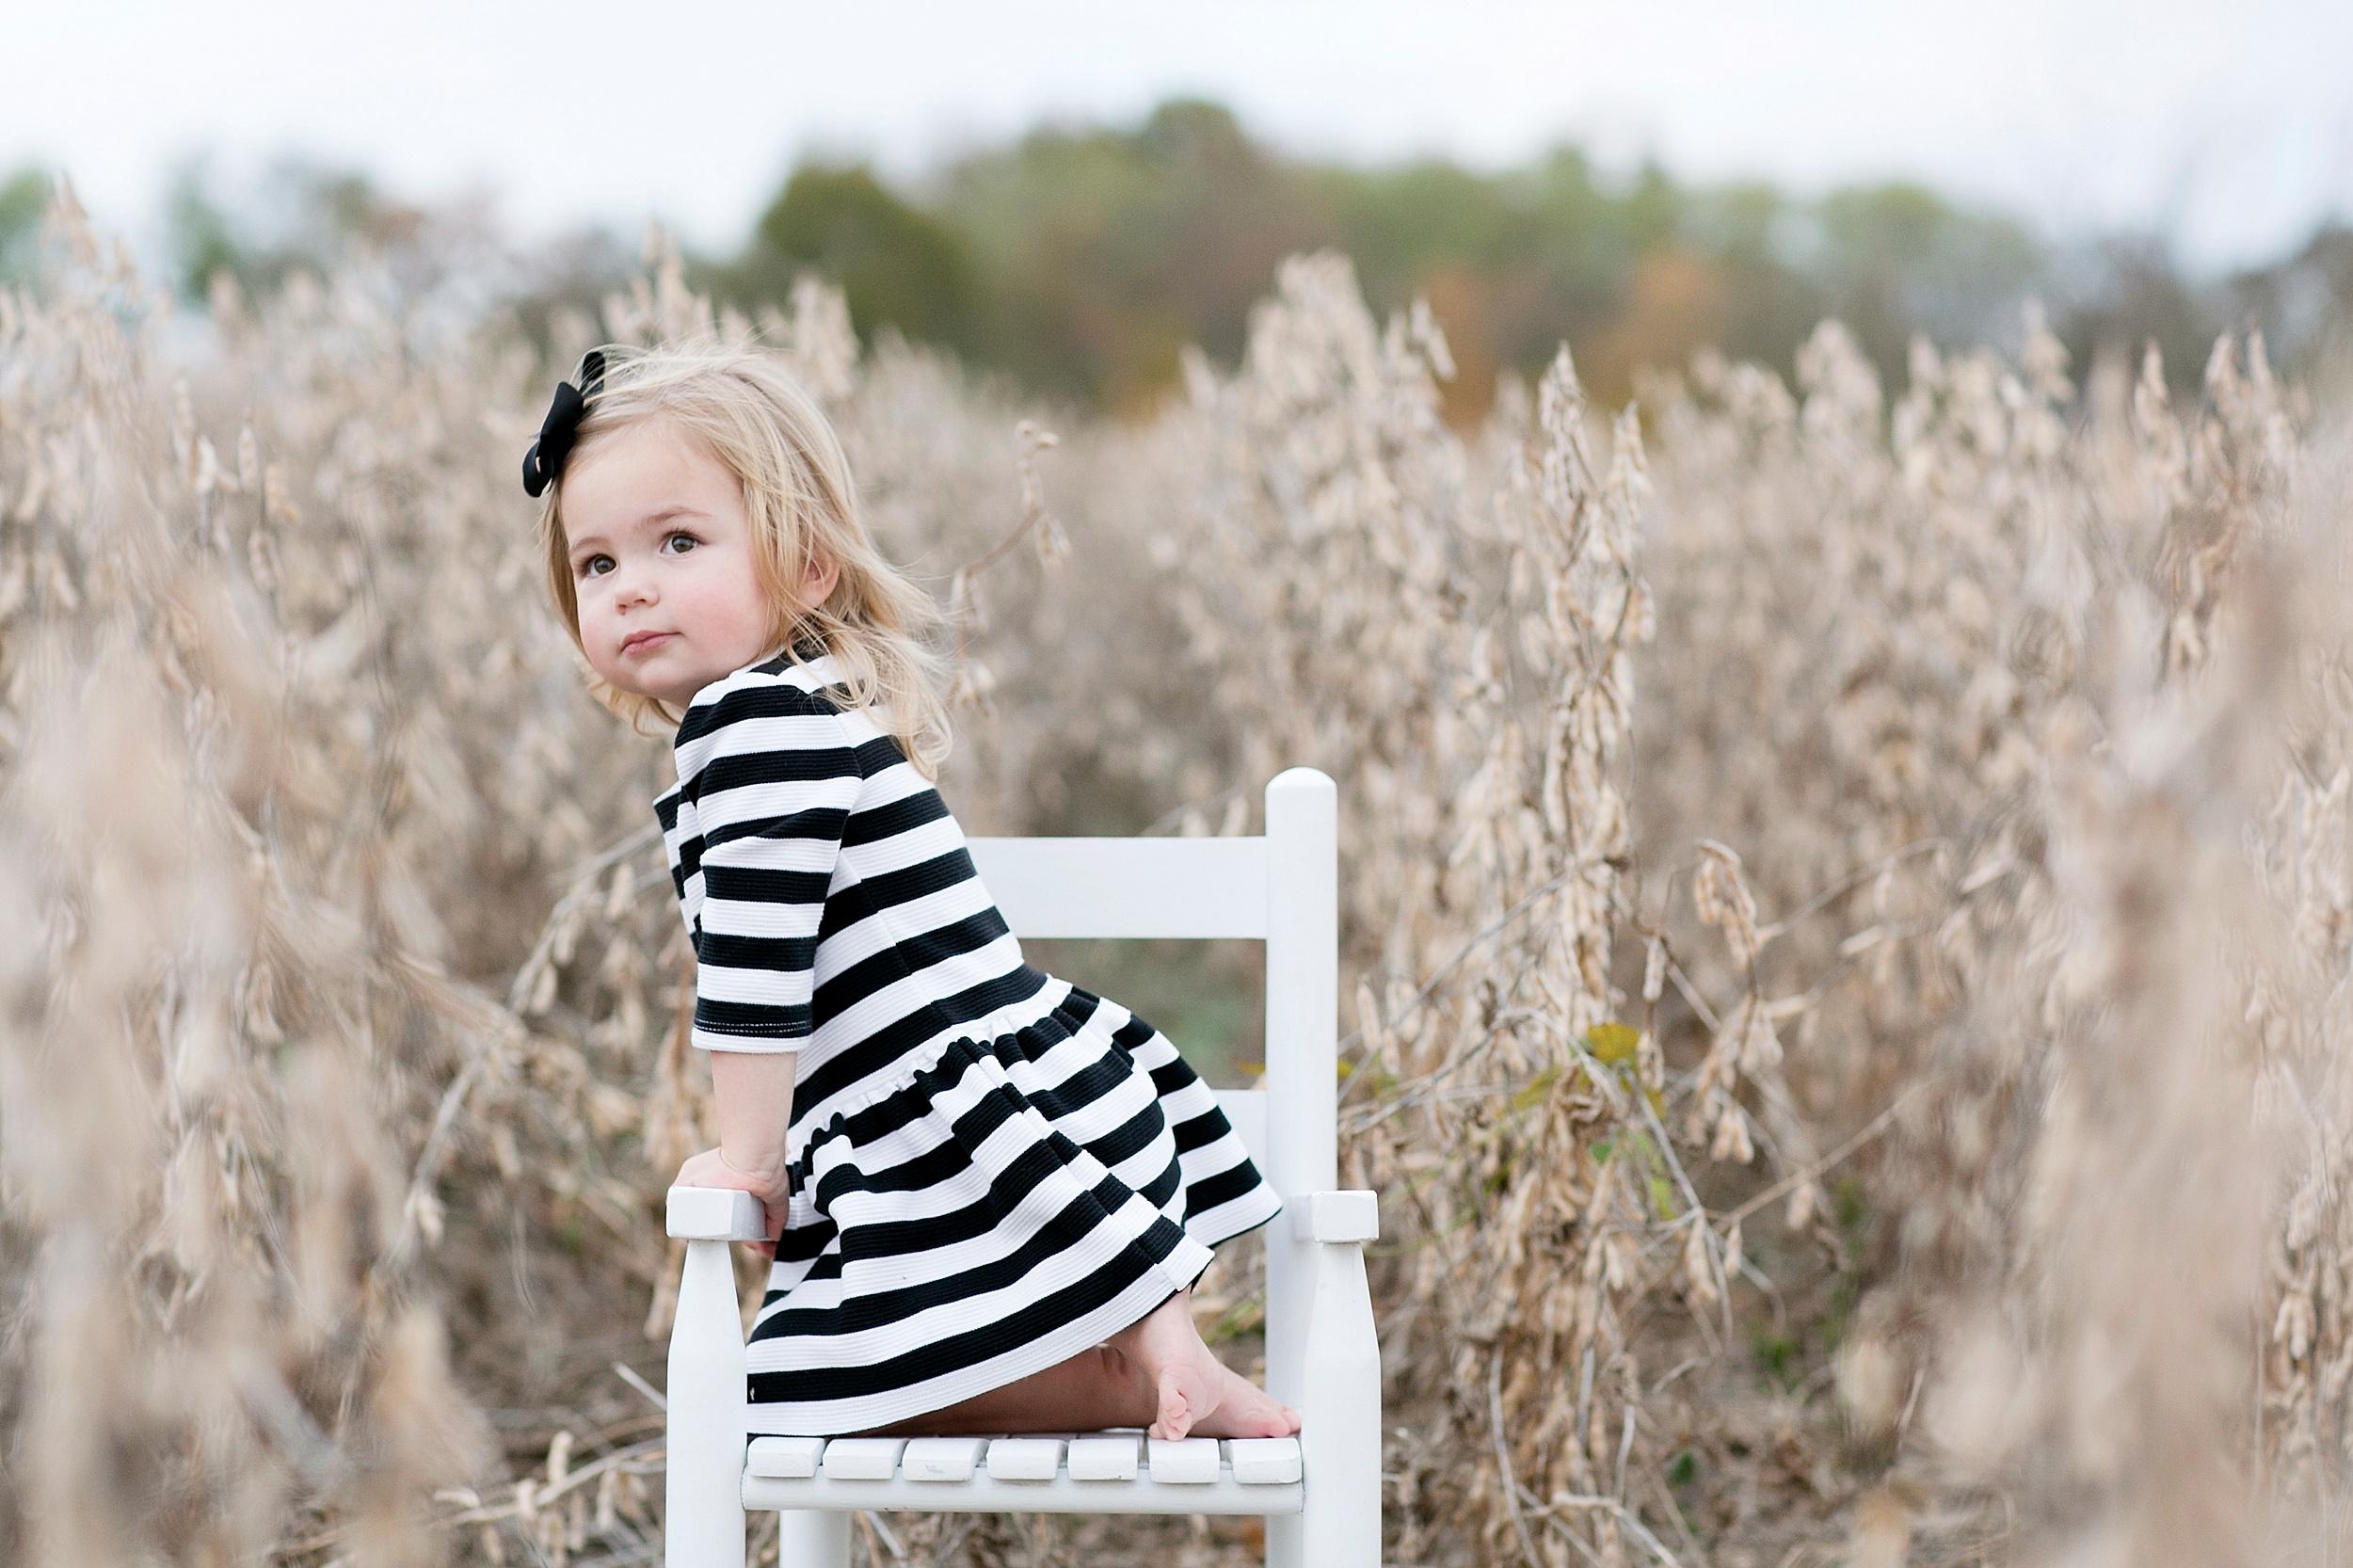 32-stripe-dress-in-rocking-chair-girl-photo.jpg